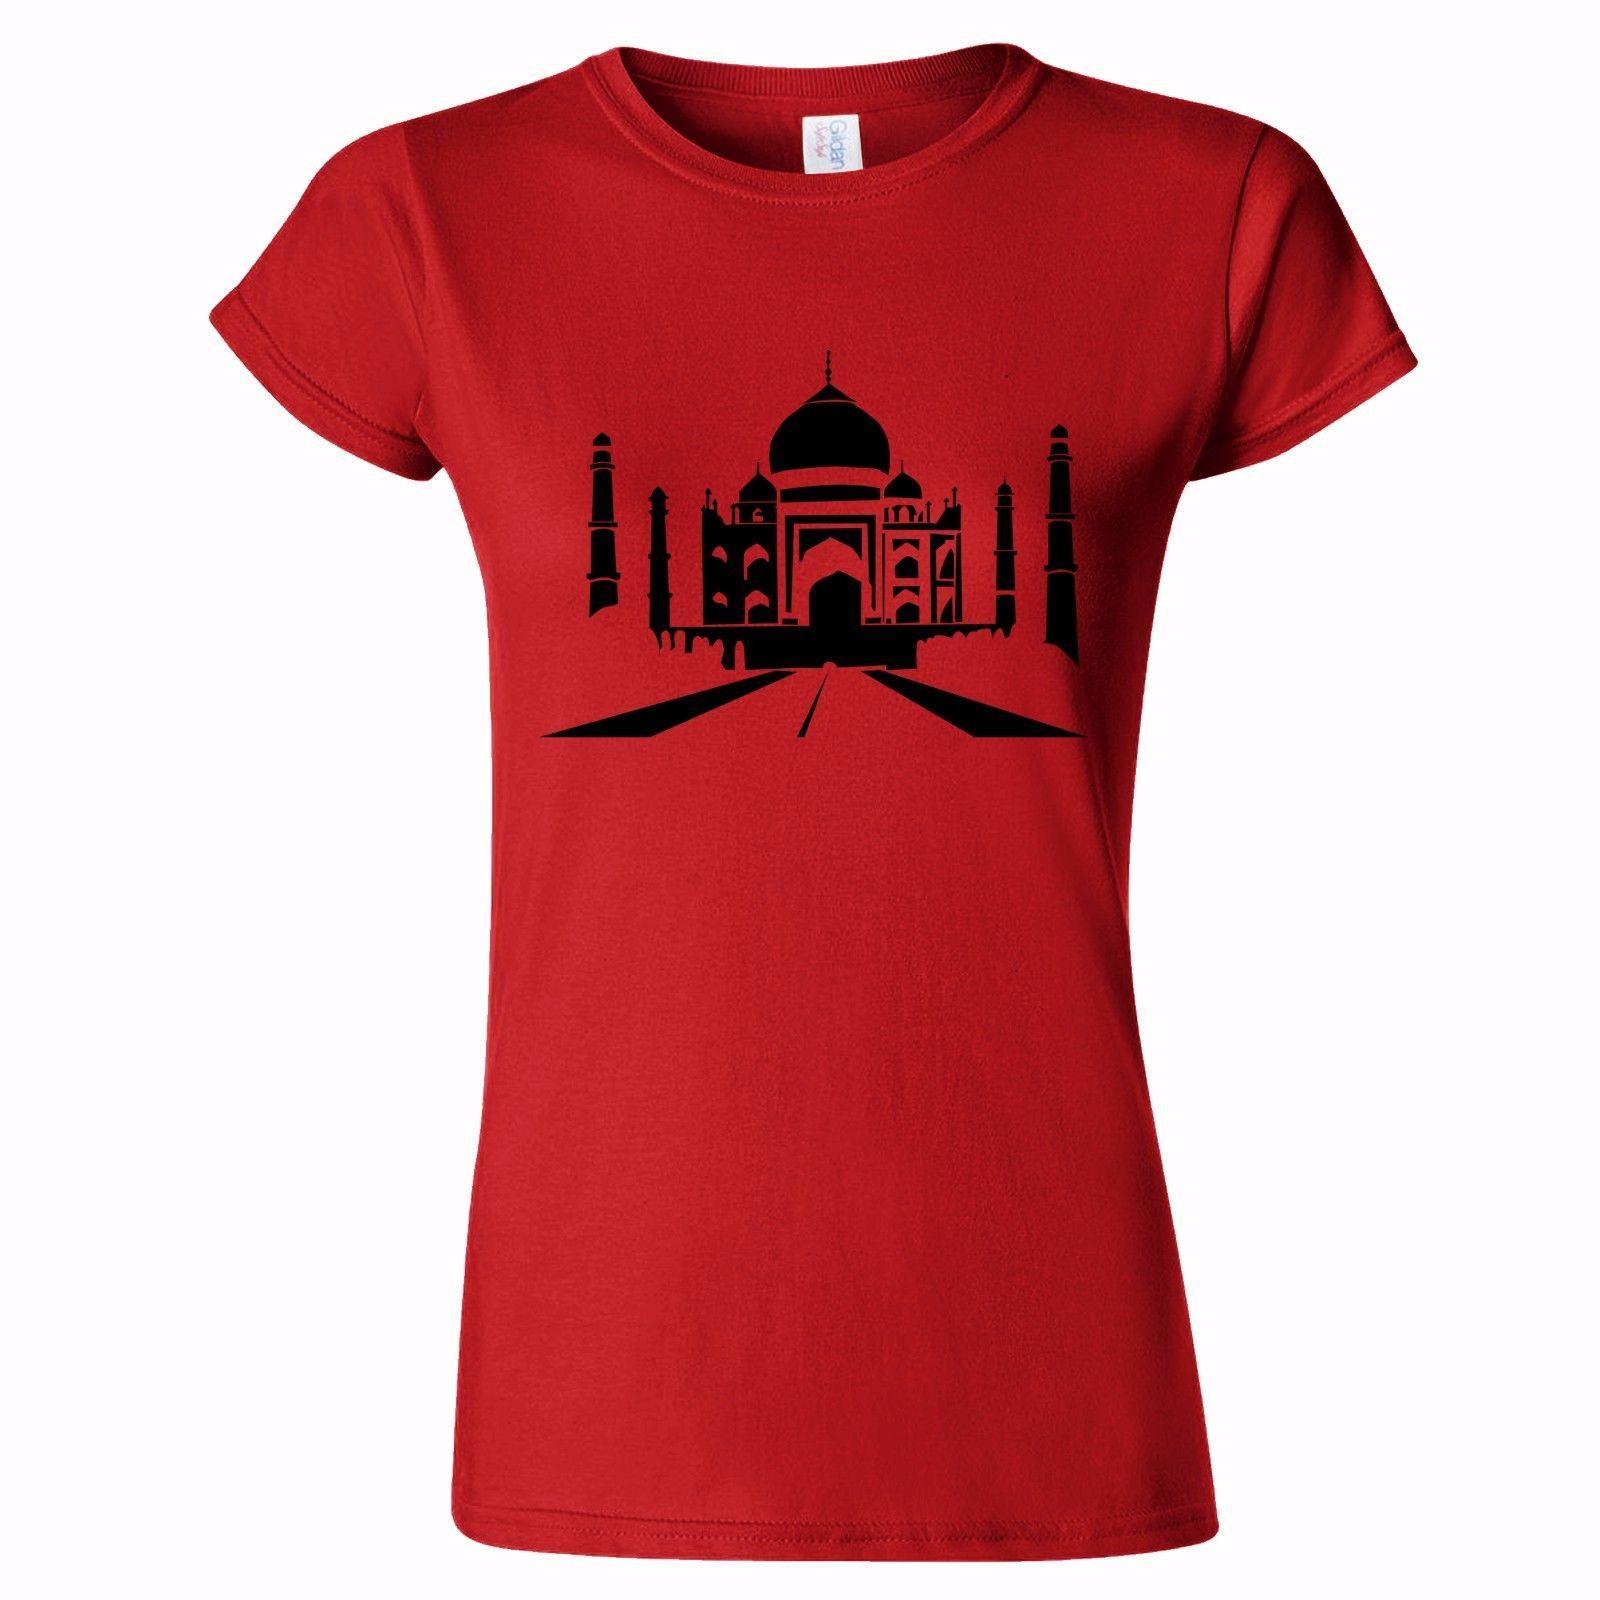 65319a243e TAJ MAHAL SILHOUETTE WOMENS T SHIRT INDIAN INDIA ART NATIONAL Cool Shirt  Design Tshirts Printed From Bangtidyclothing, $10.9| DHgate.Com